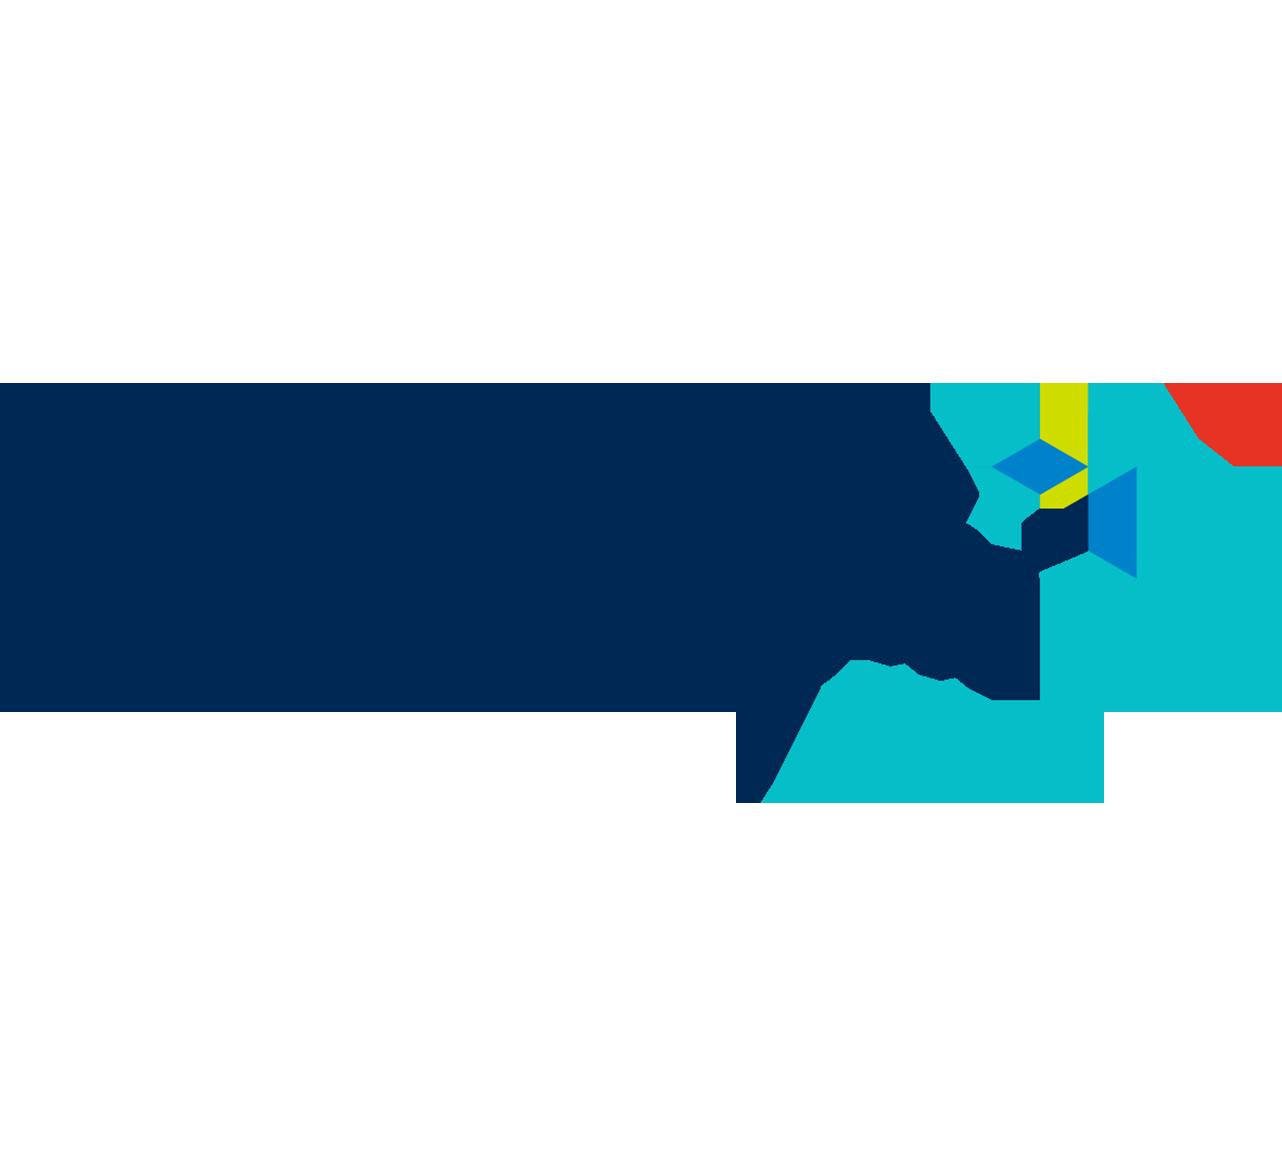 turktelekom logo